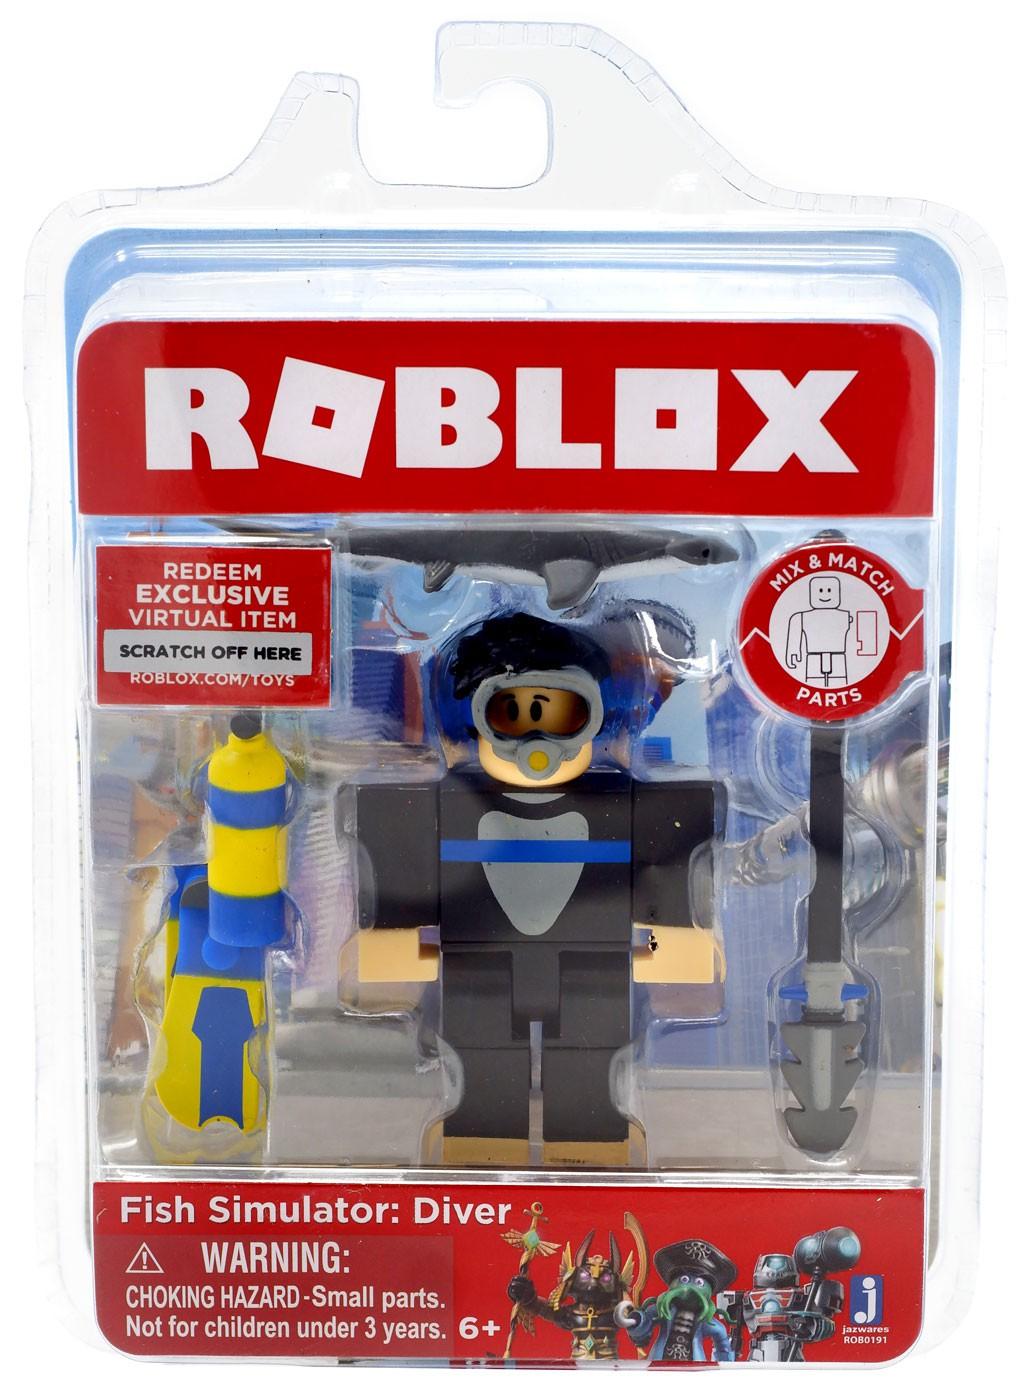 Roblox Fish Simulator: Diver Action Figure – Walmart